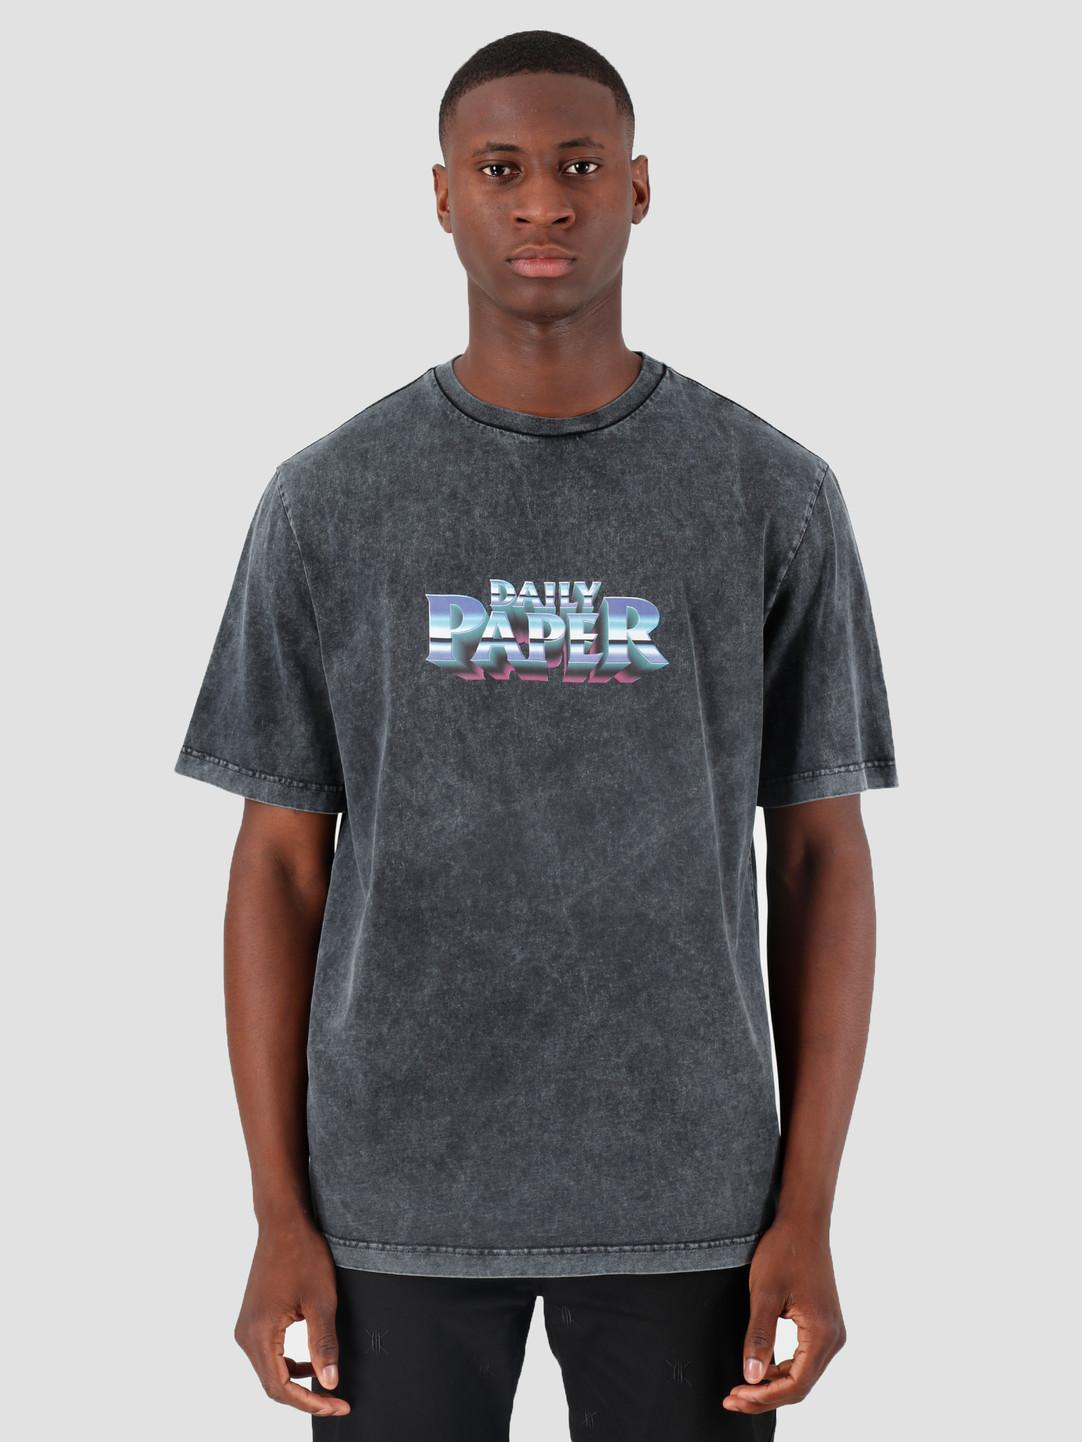 Daily Paper Daily Paper Gublu T-Shirt Acid Air Blue 19F1TS27-01